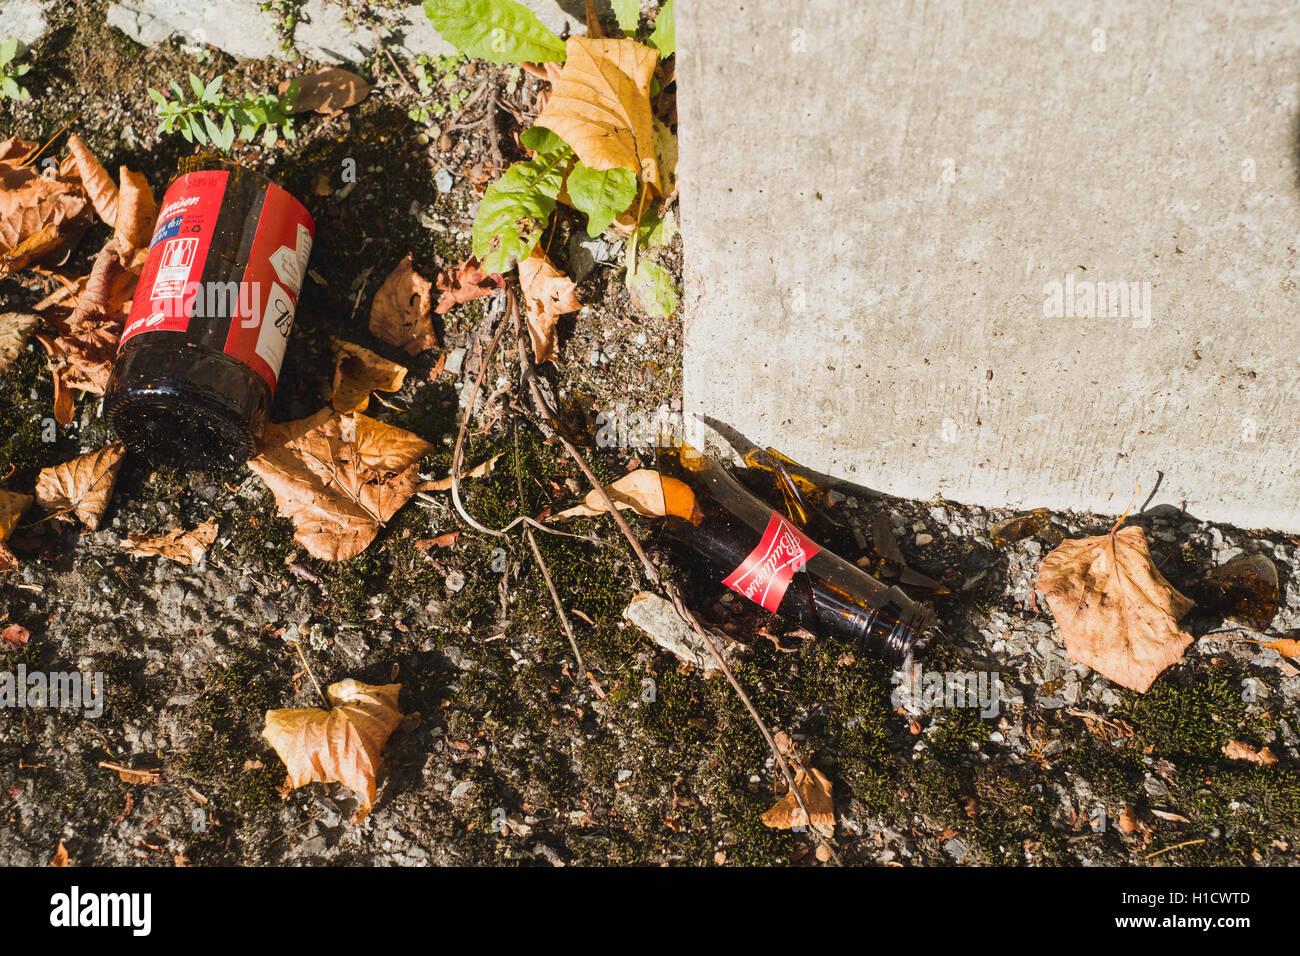 A broken Budweiser beer bottle - Stock Image